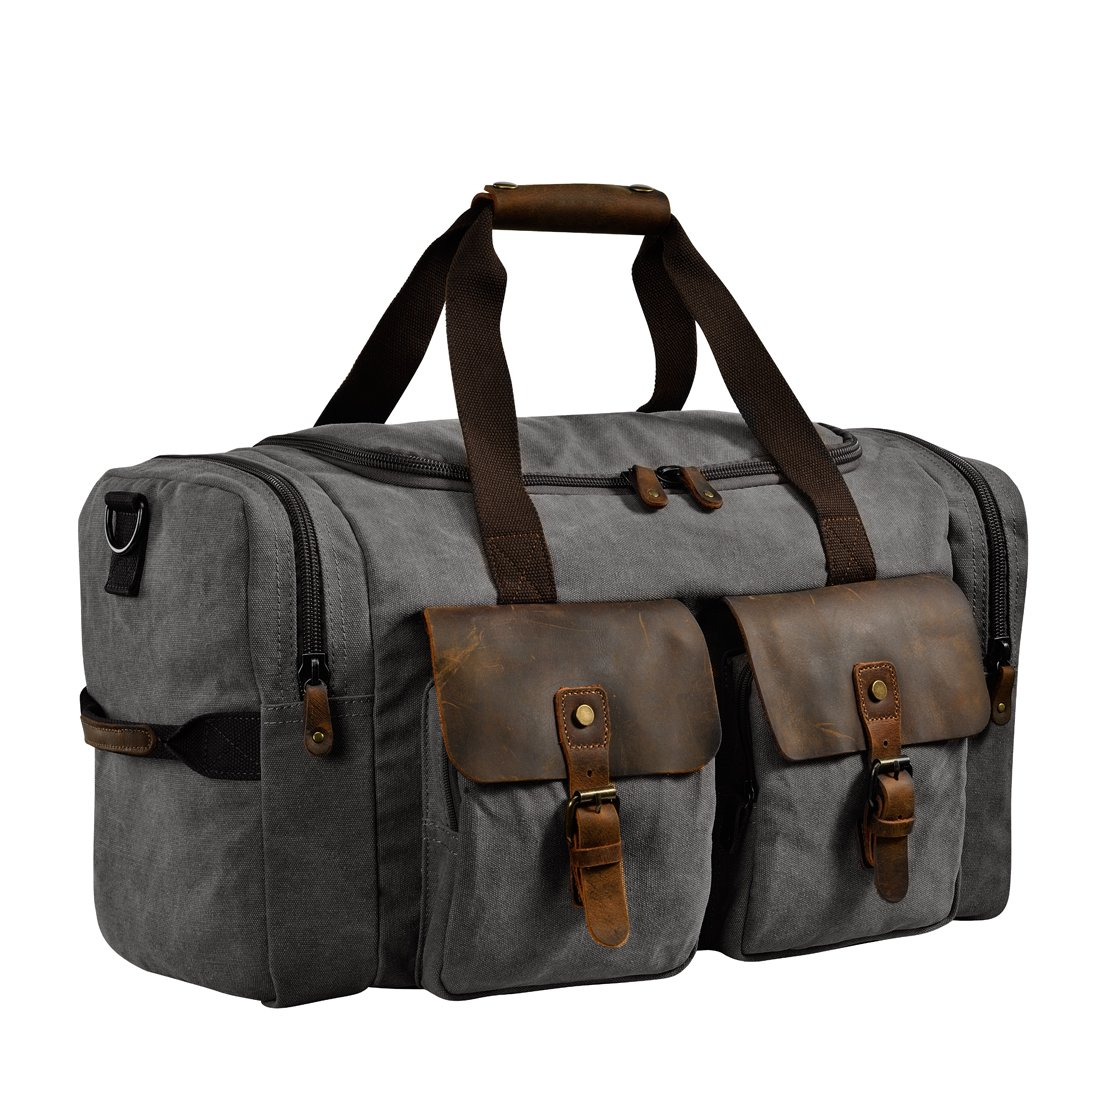 Kopack Travel Duffel Bag W Shoe Pocket Genuine Leather Mens Weekender Bag Canvas Khaki/Grey/Army Green 22''x14''x10''